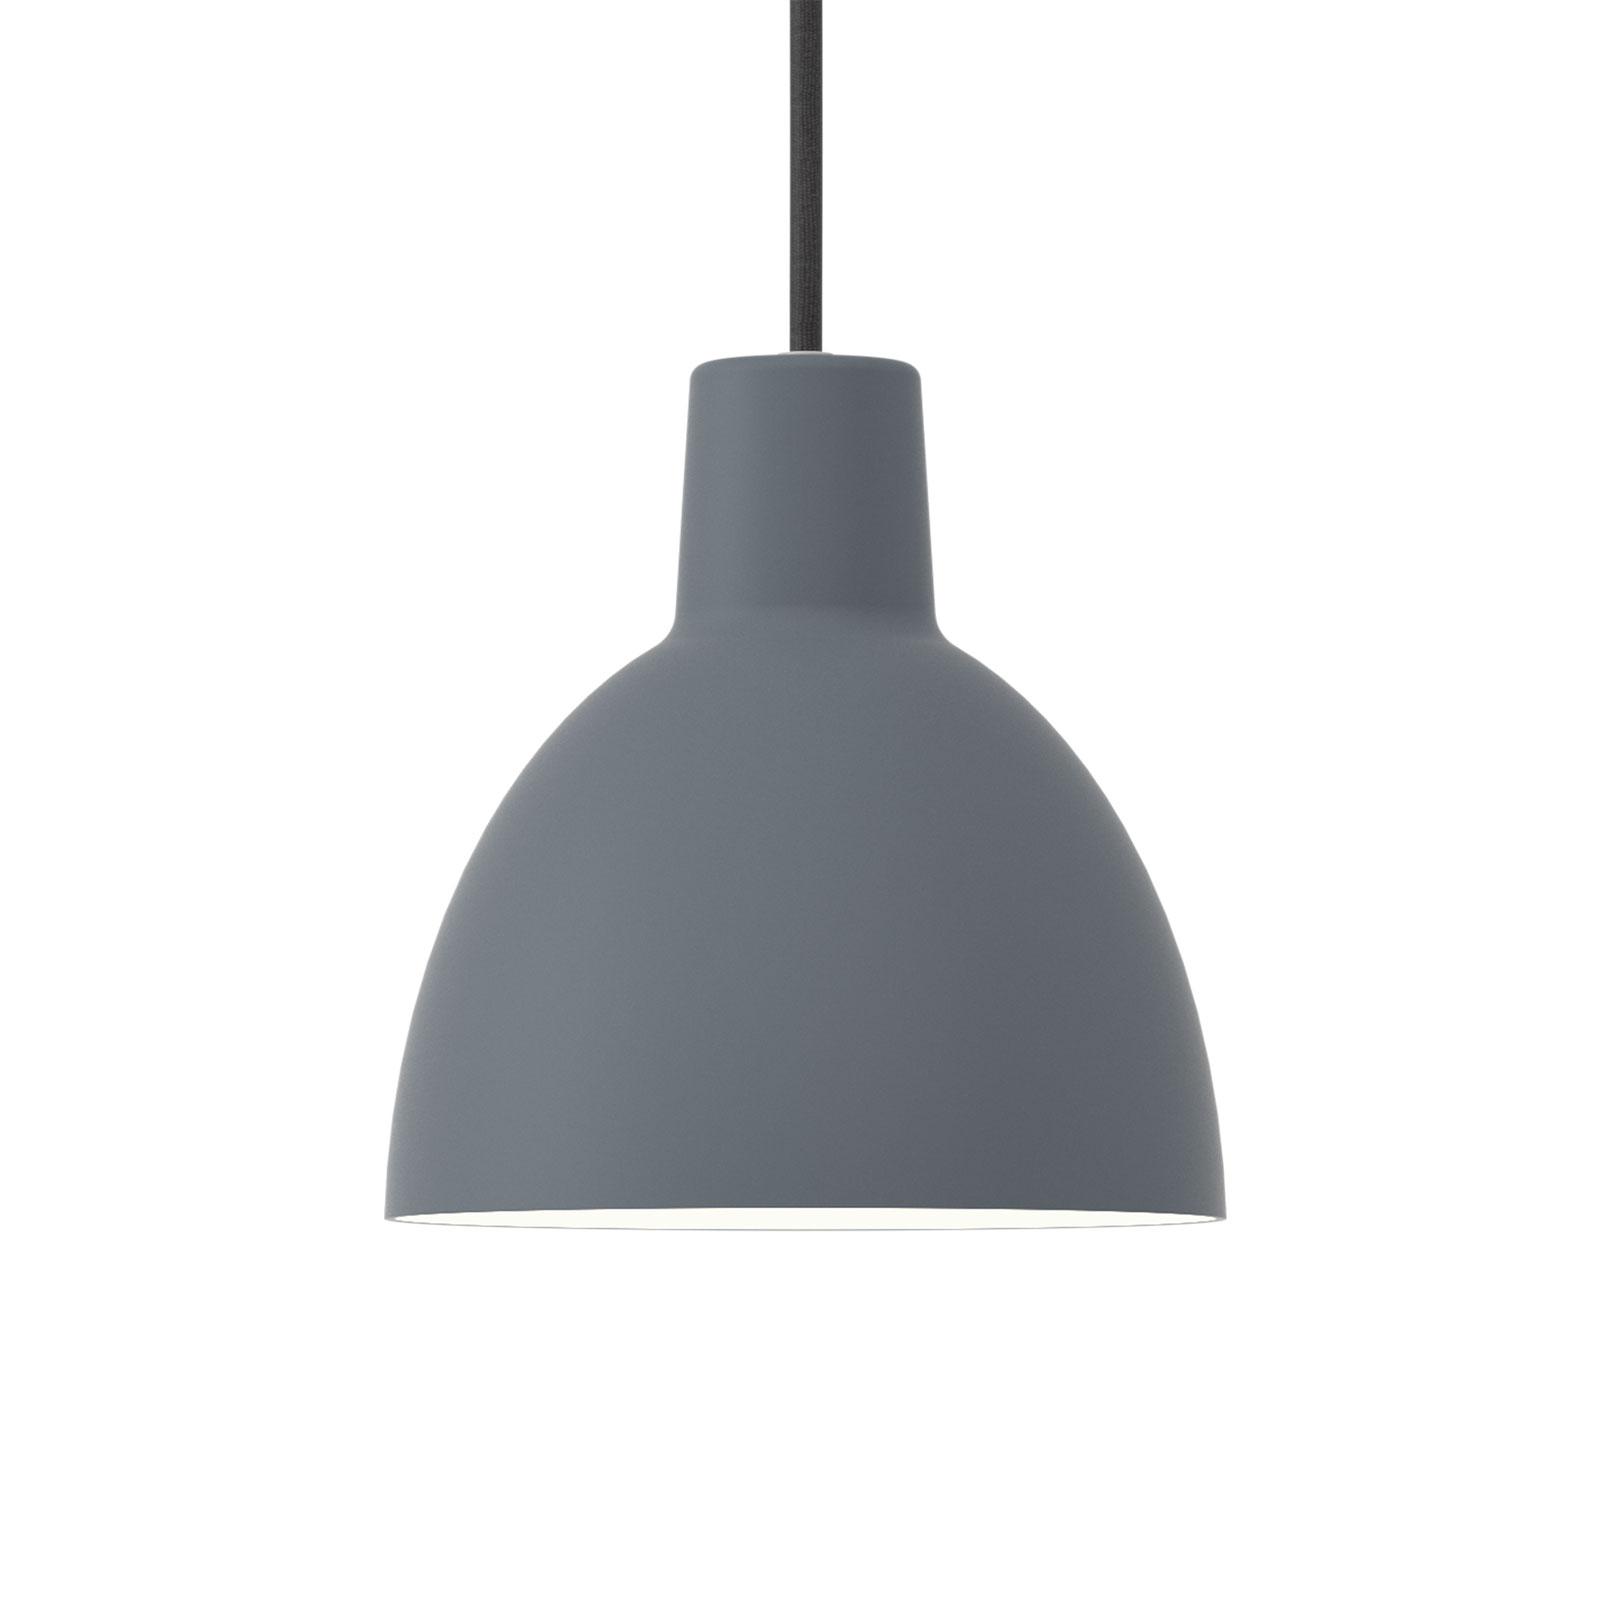 Louis Poulsen hanglamp Toldbod 170, blauwgrijs